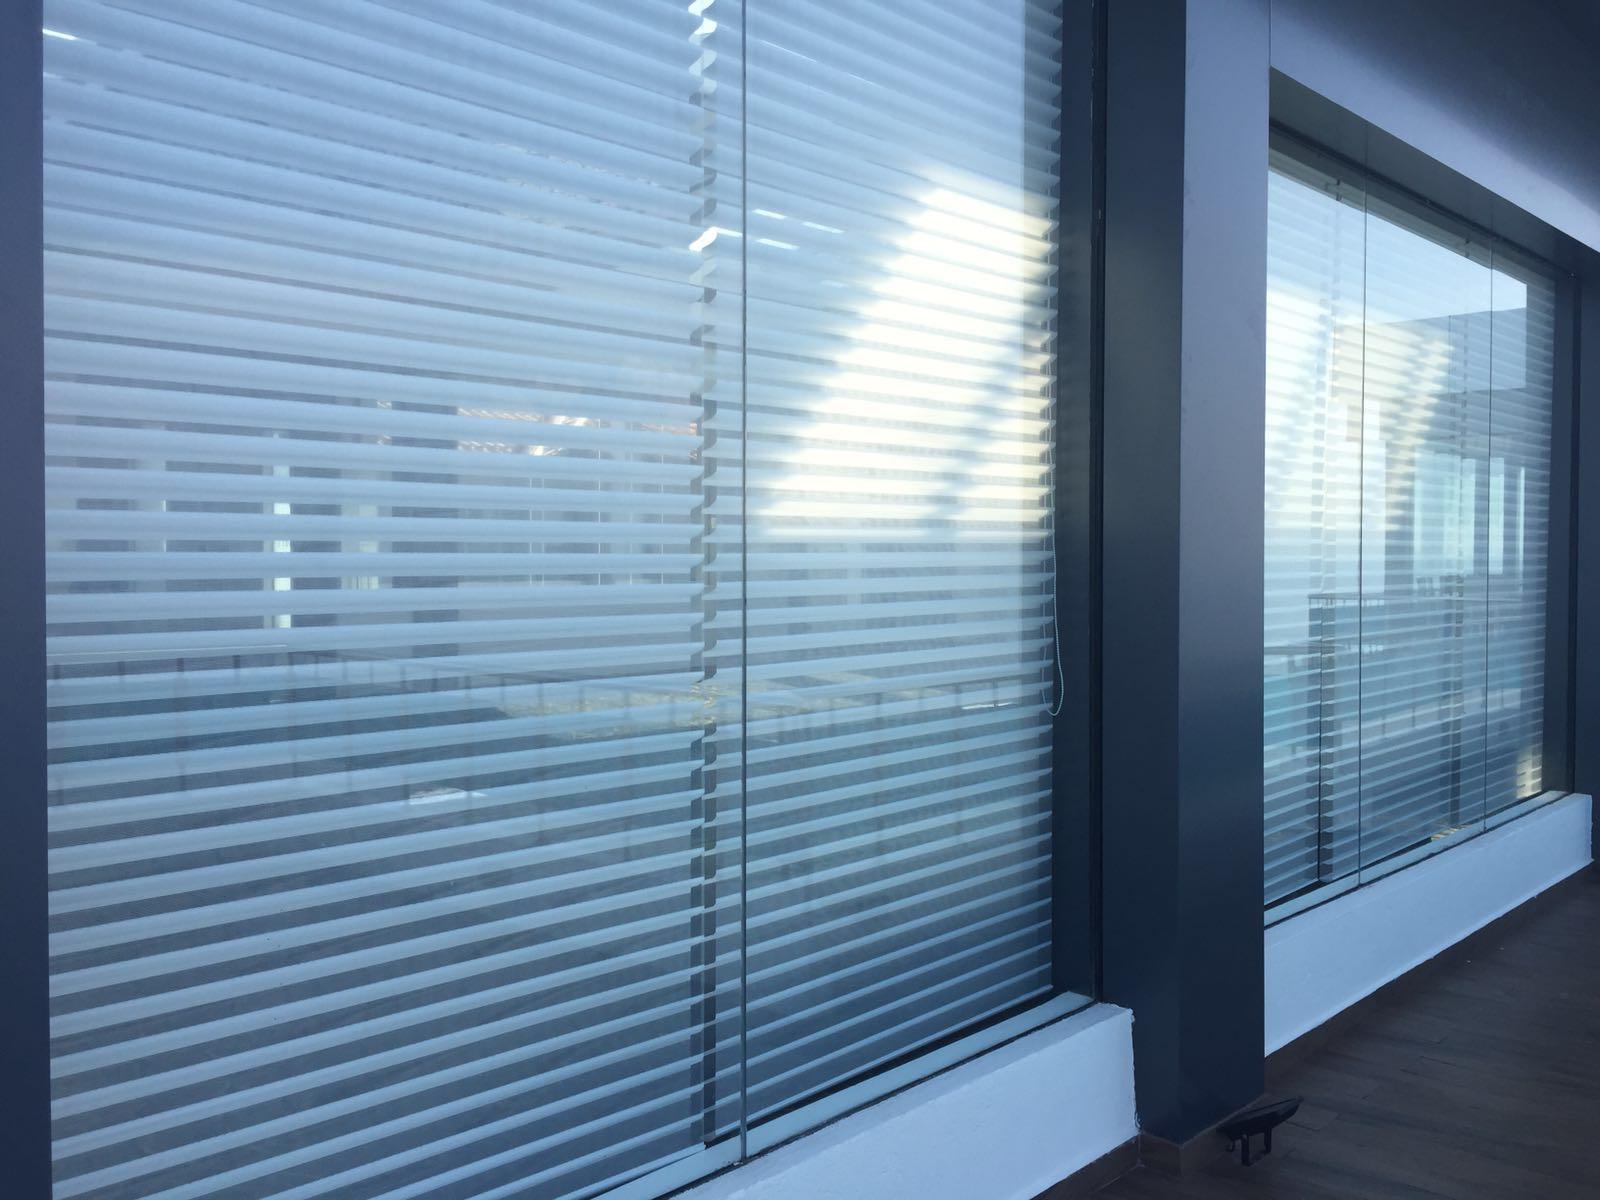 Shadow Blinds Window Blinds Light Amp Shade Sri Lanka